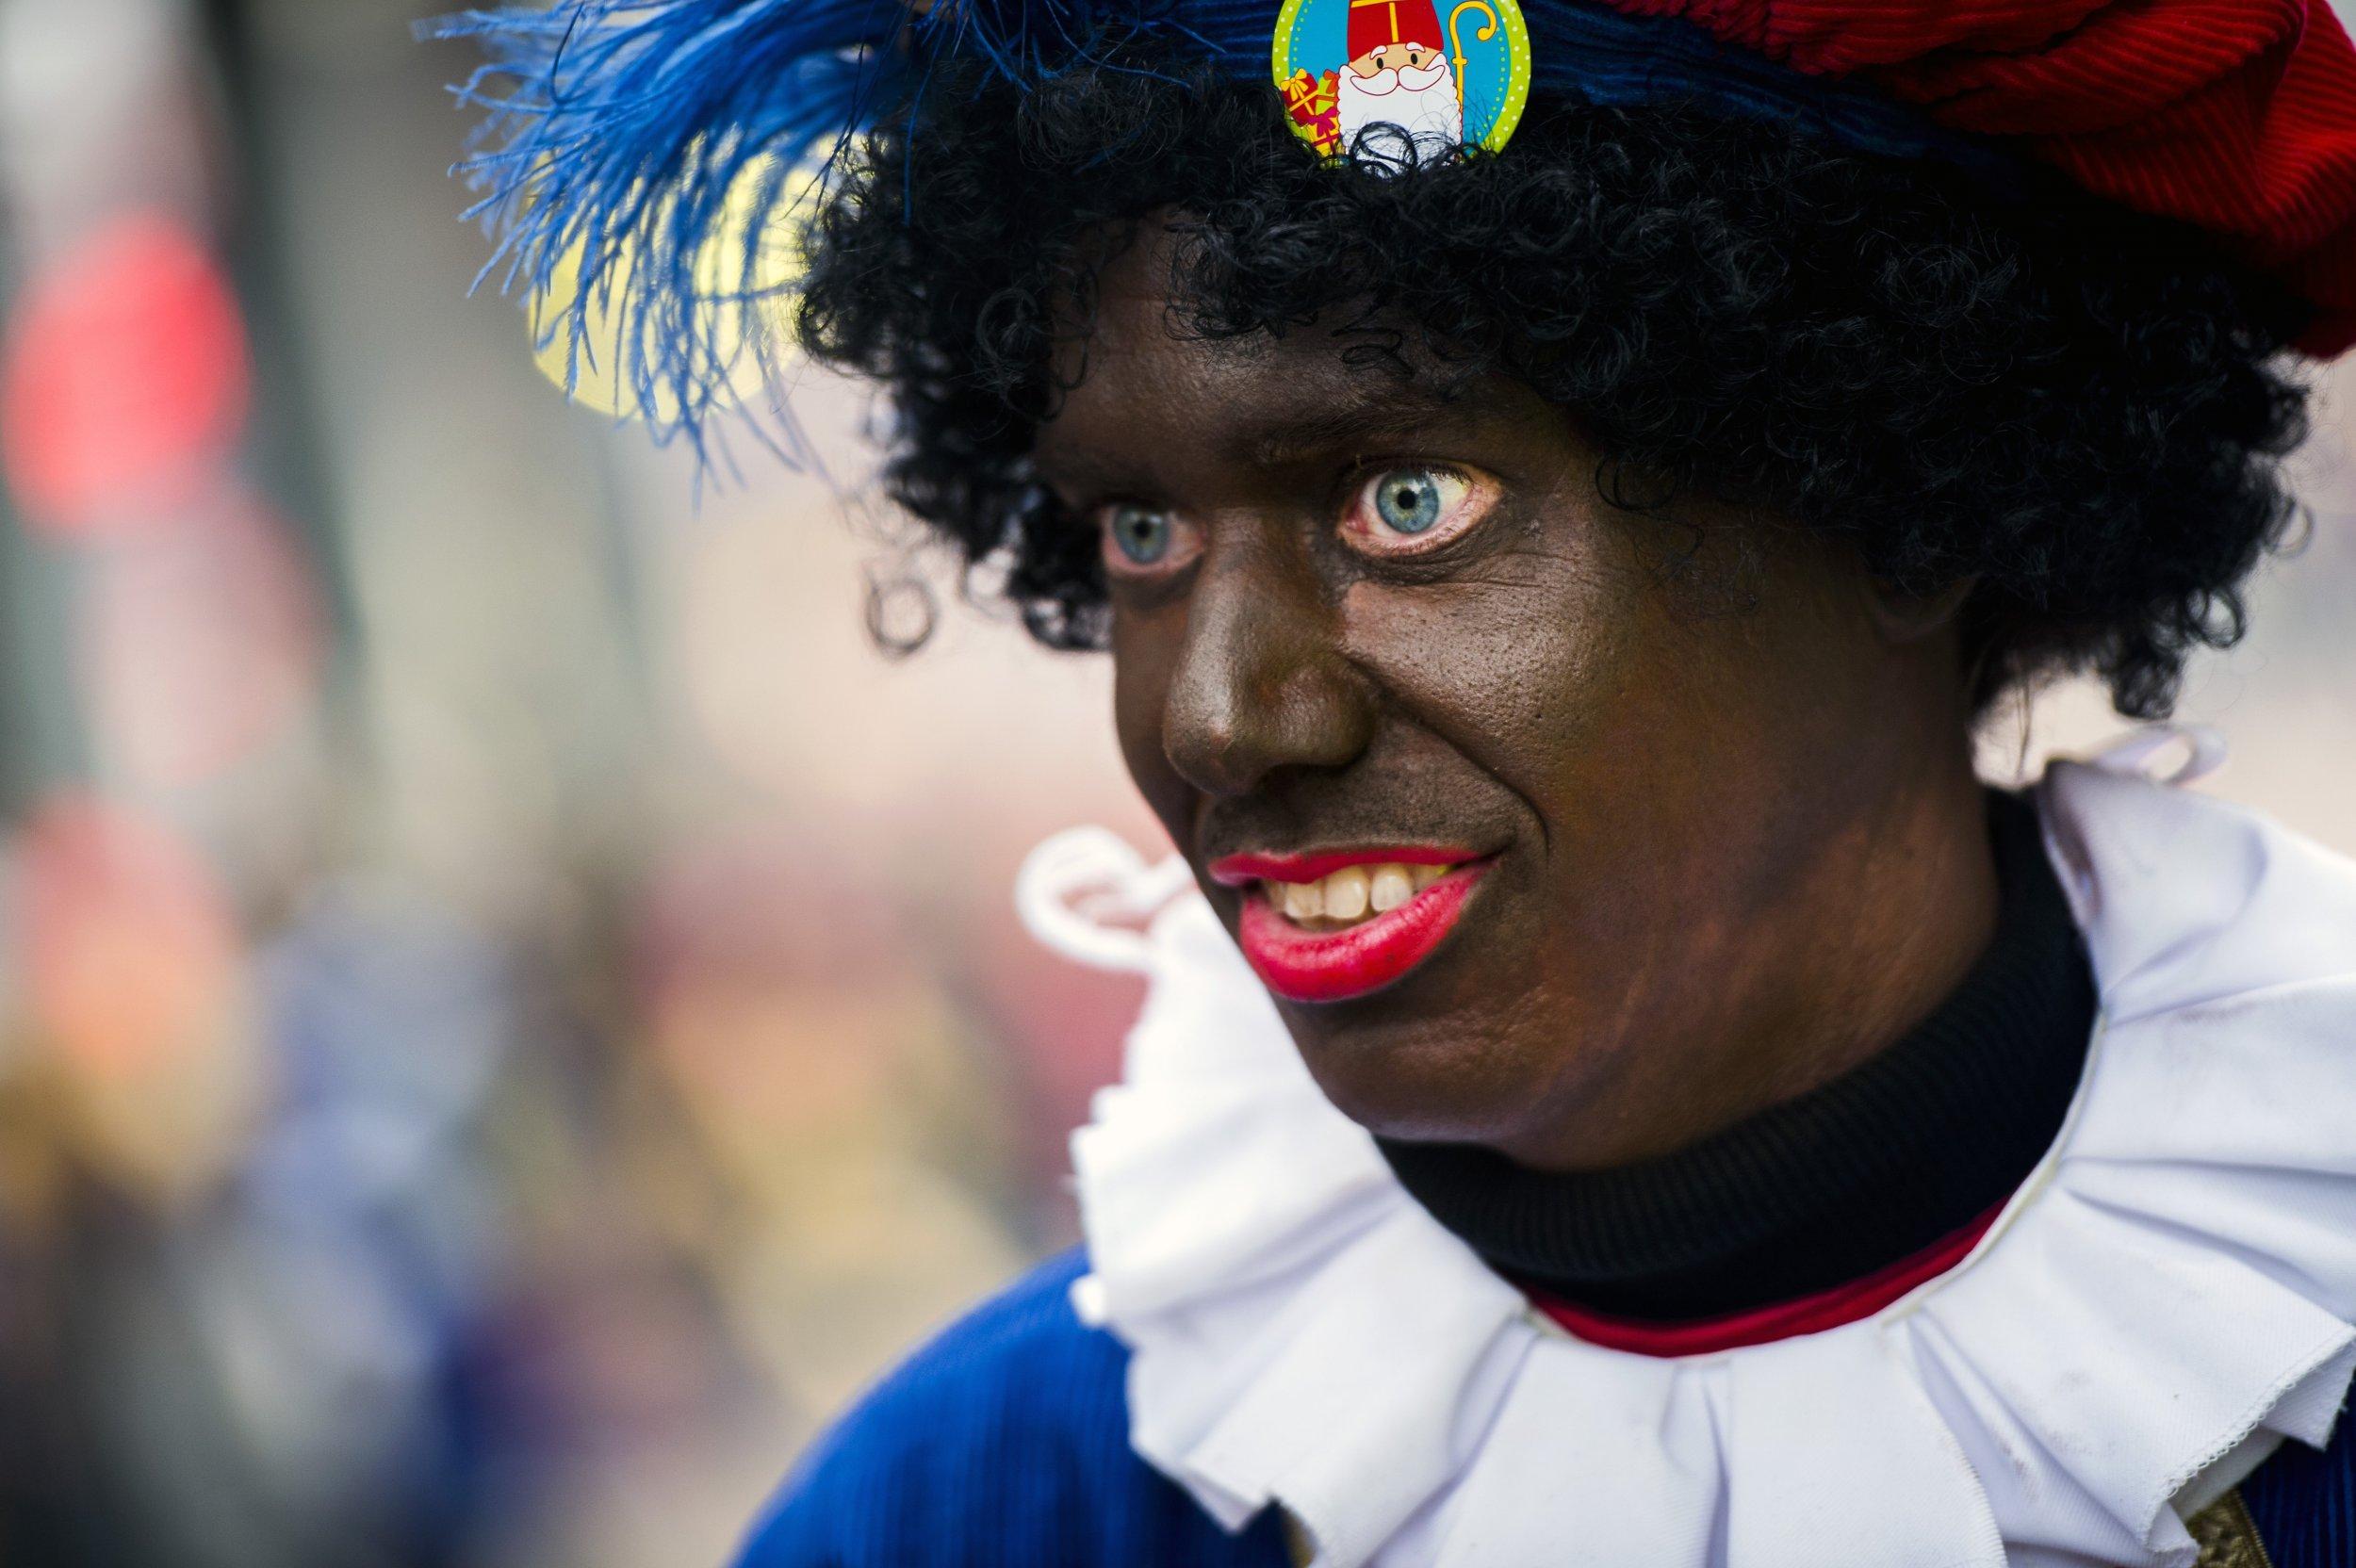 Dutch Christmas.Dutch Santa S Racist Helper Black Pete To Be Given Slow